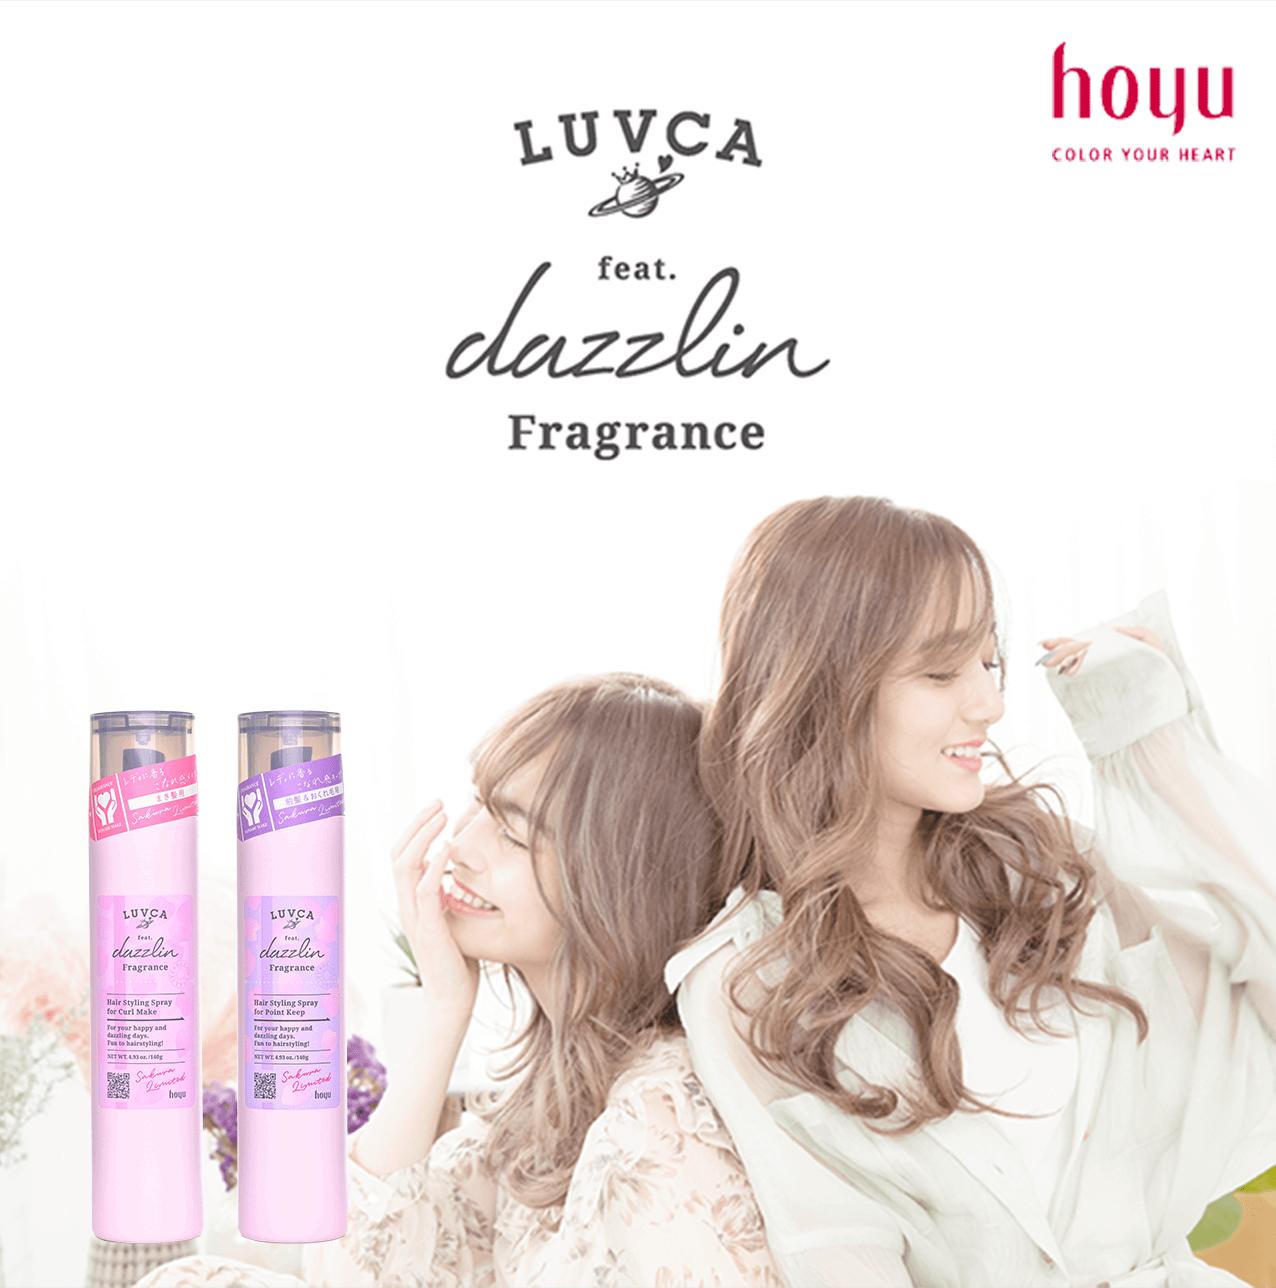 LUVCA dazzlin Fragrance